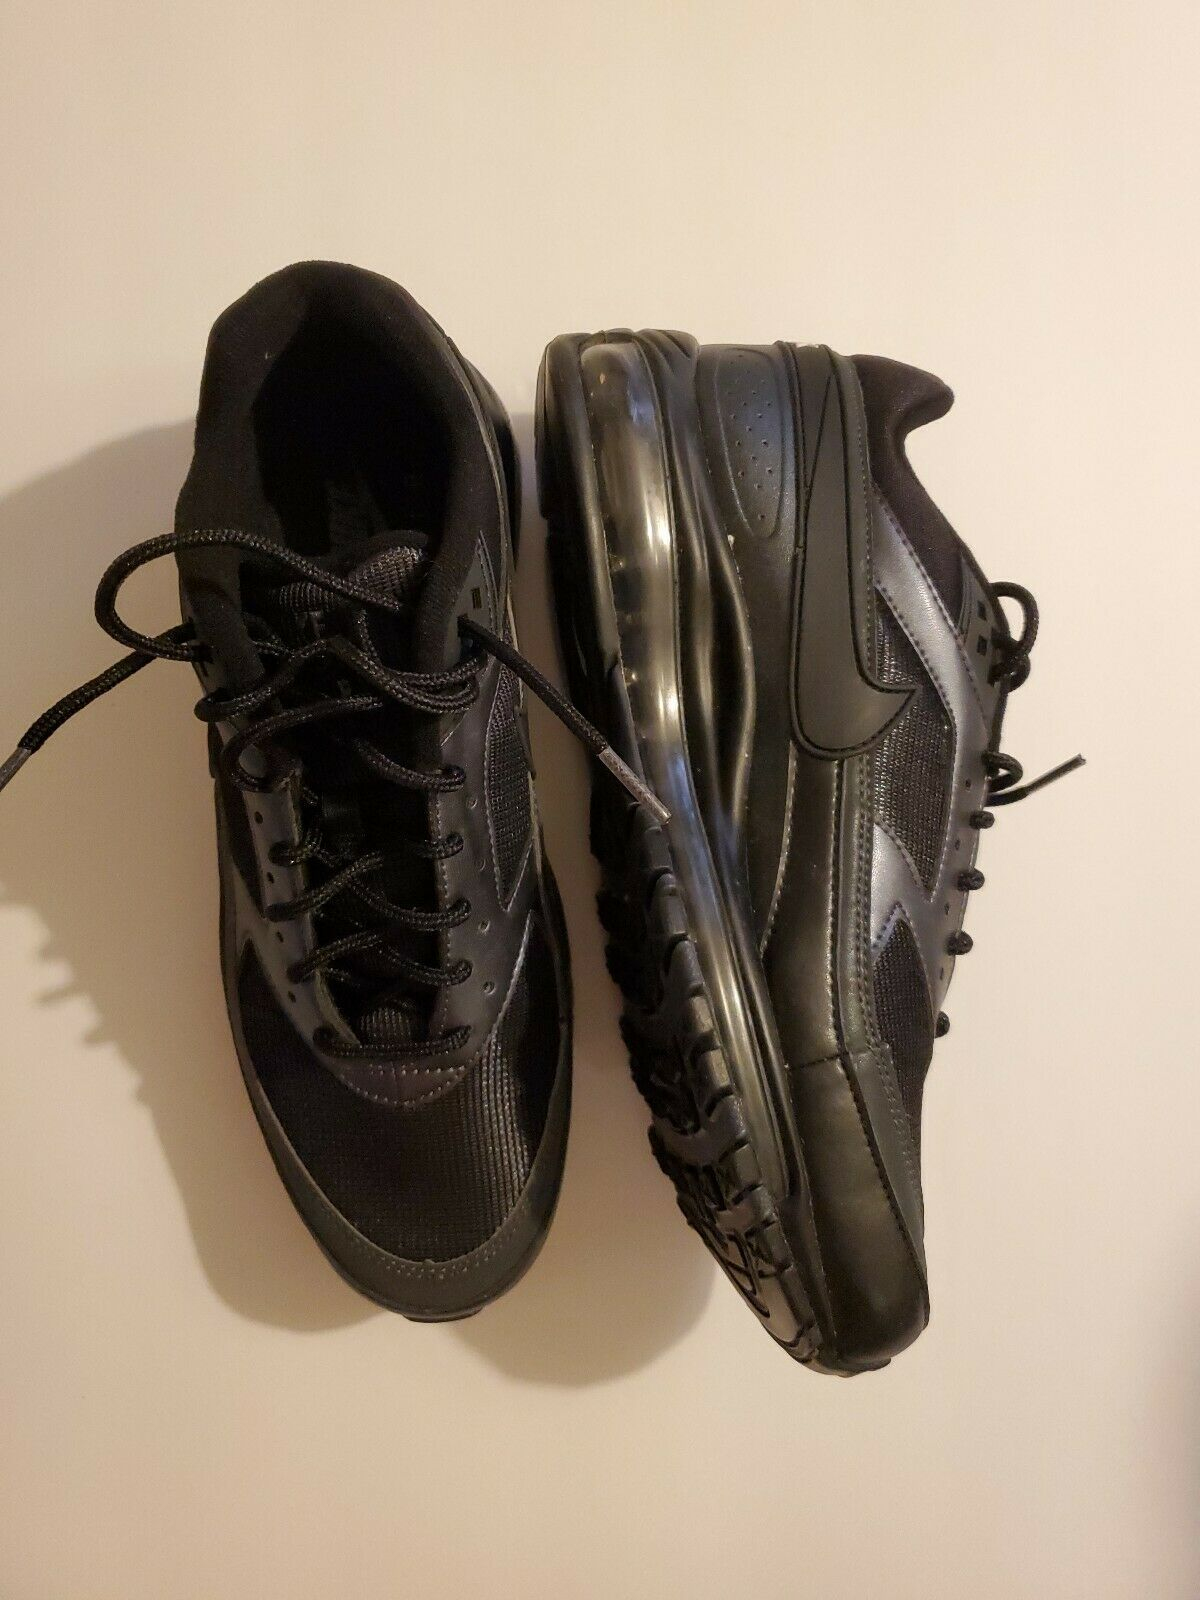 Nike Air Max 97/BW Running Shoes Black Metallic Hematite Men's Sz 7 AO2406-001 image 4